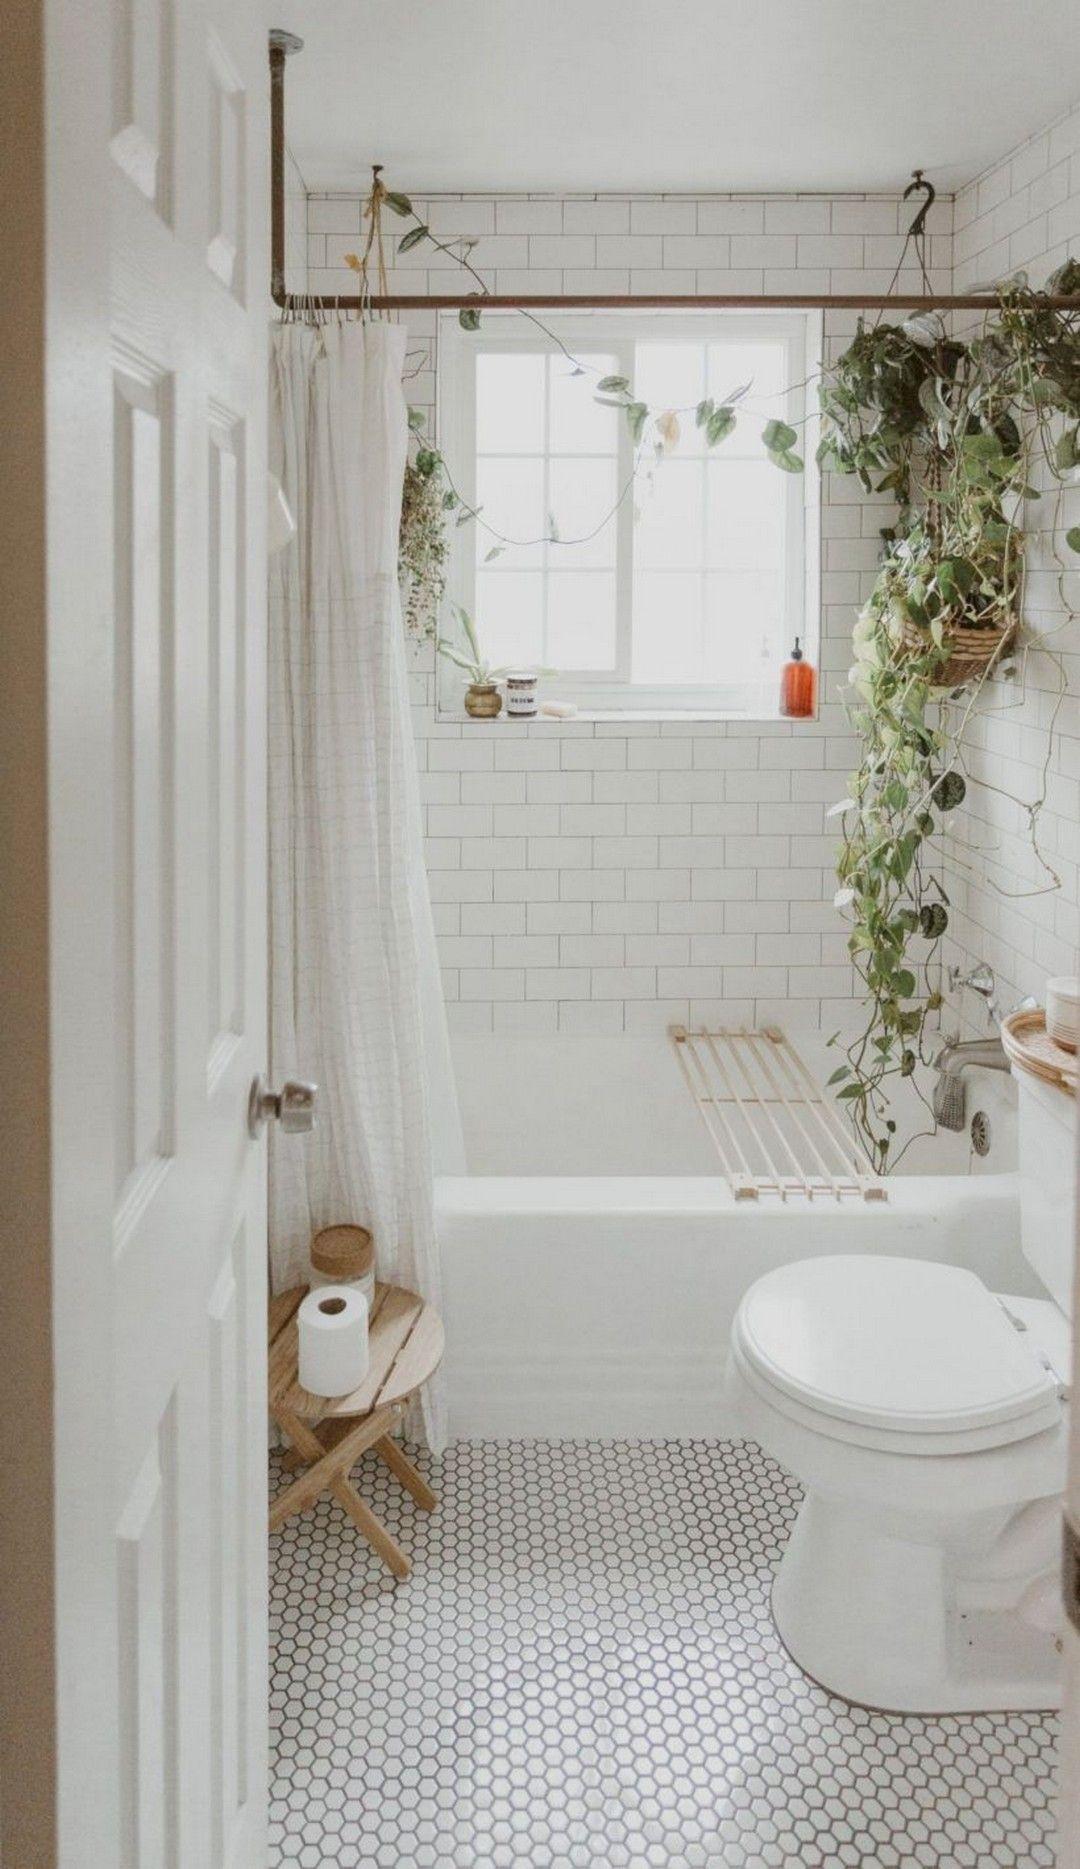 28 Simple Bathroom Decorating Ideas